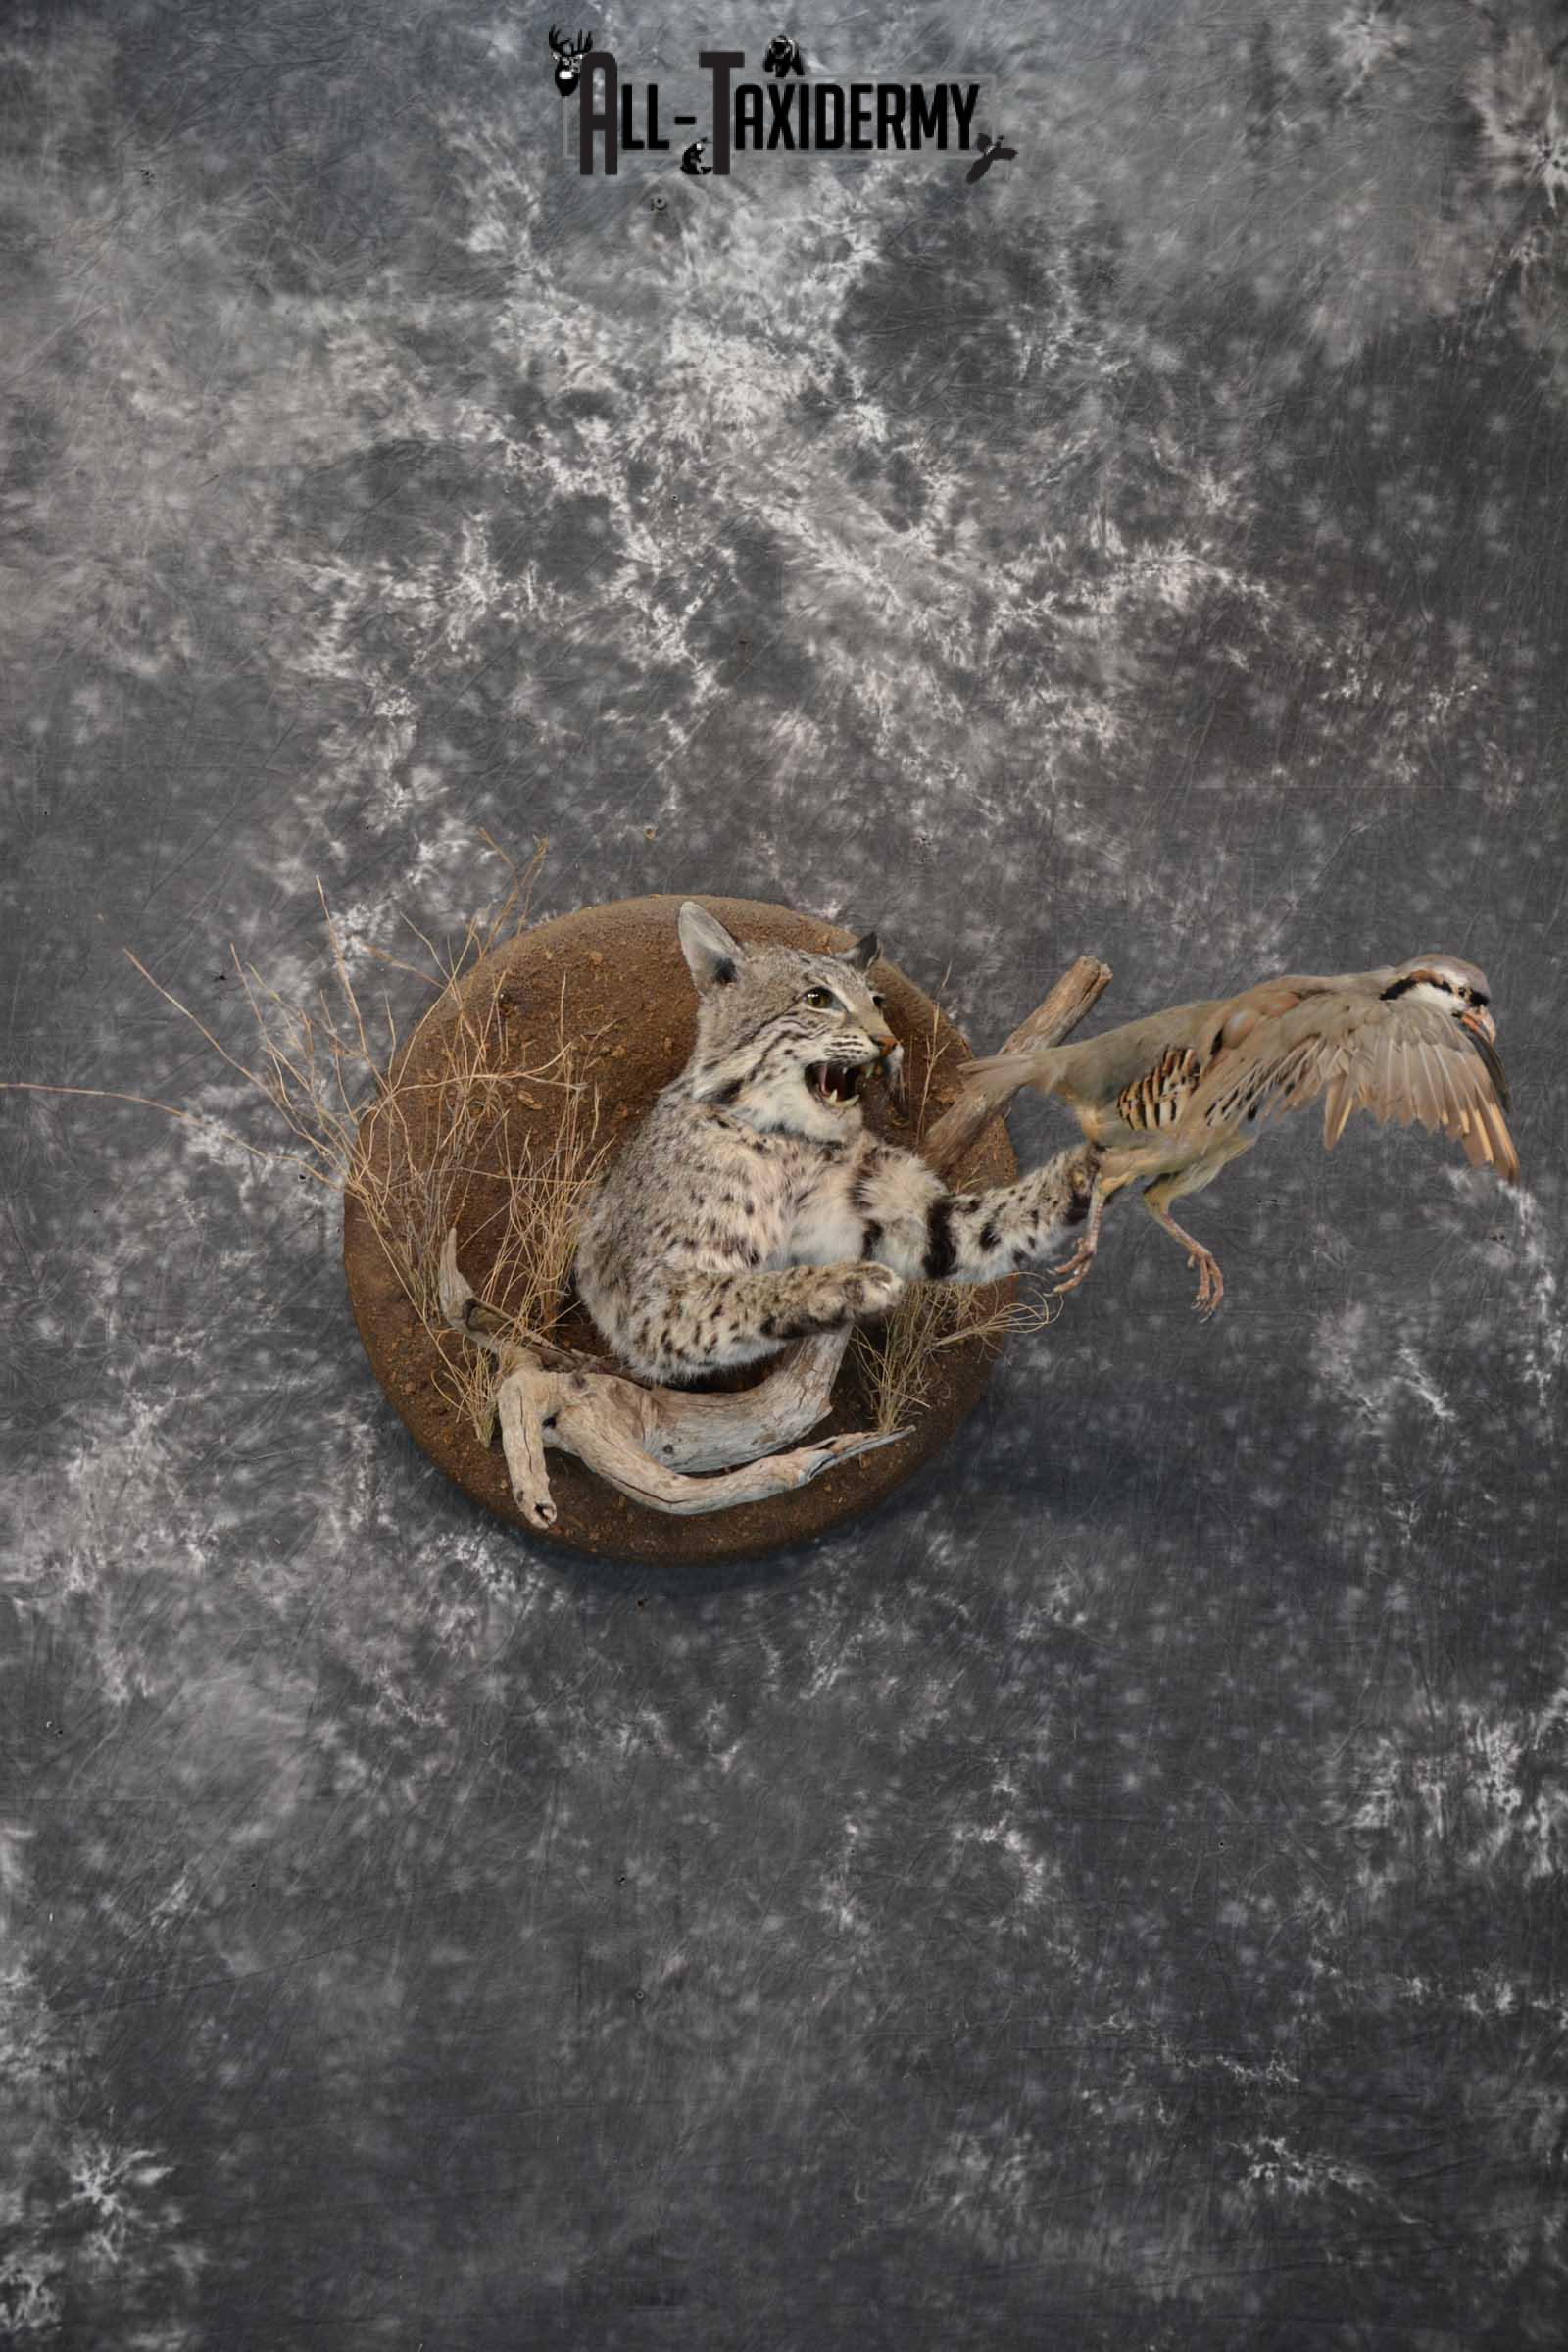 1/2 Body bobcat w/ Chukar Partridge Taxidermy mount for sale SKU 1788